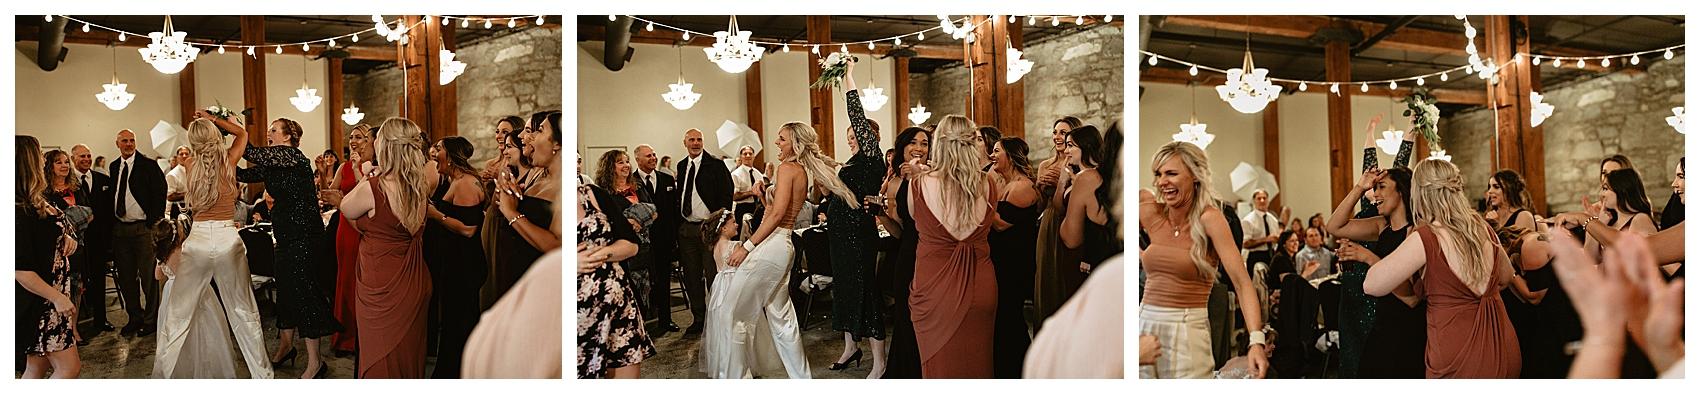 Chateau Rive Spokane Wedding Cassie Trottier Photography01108.jpg